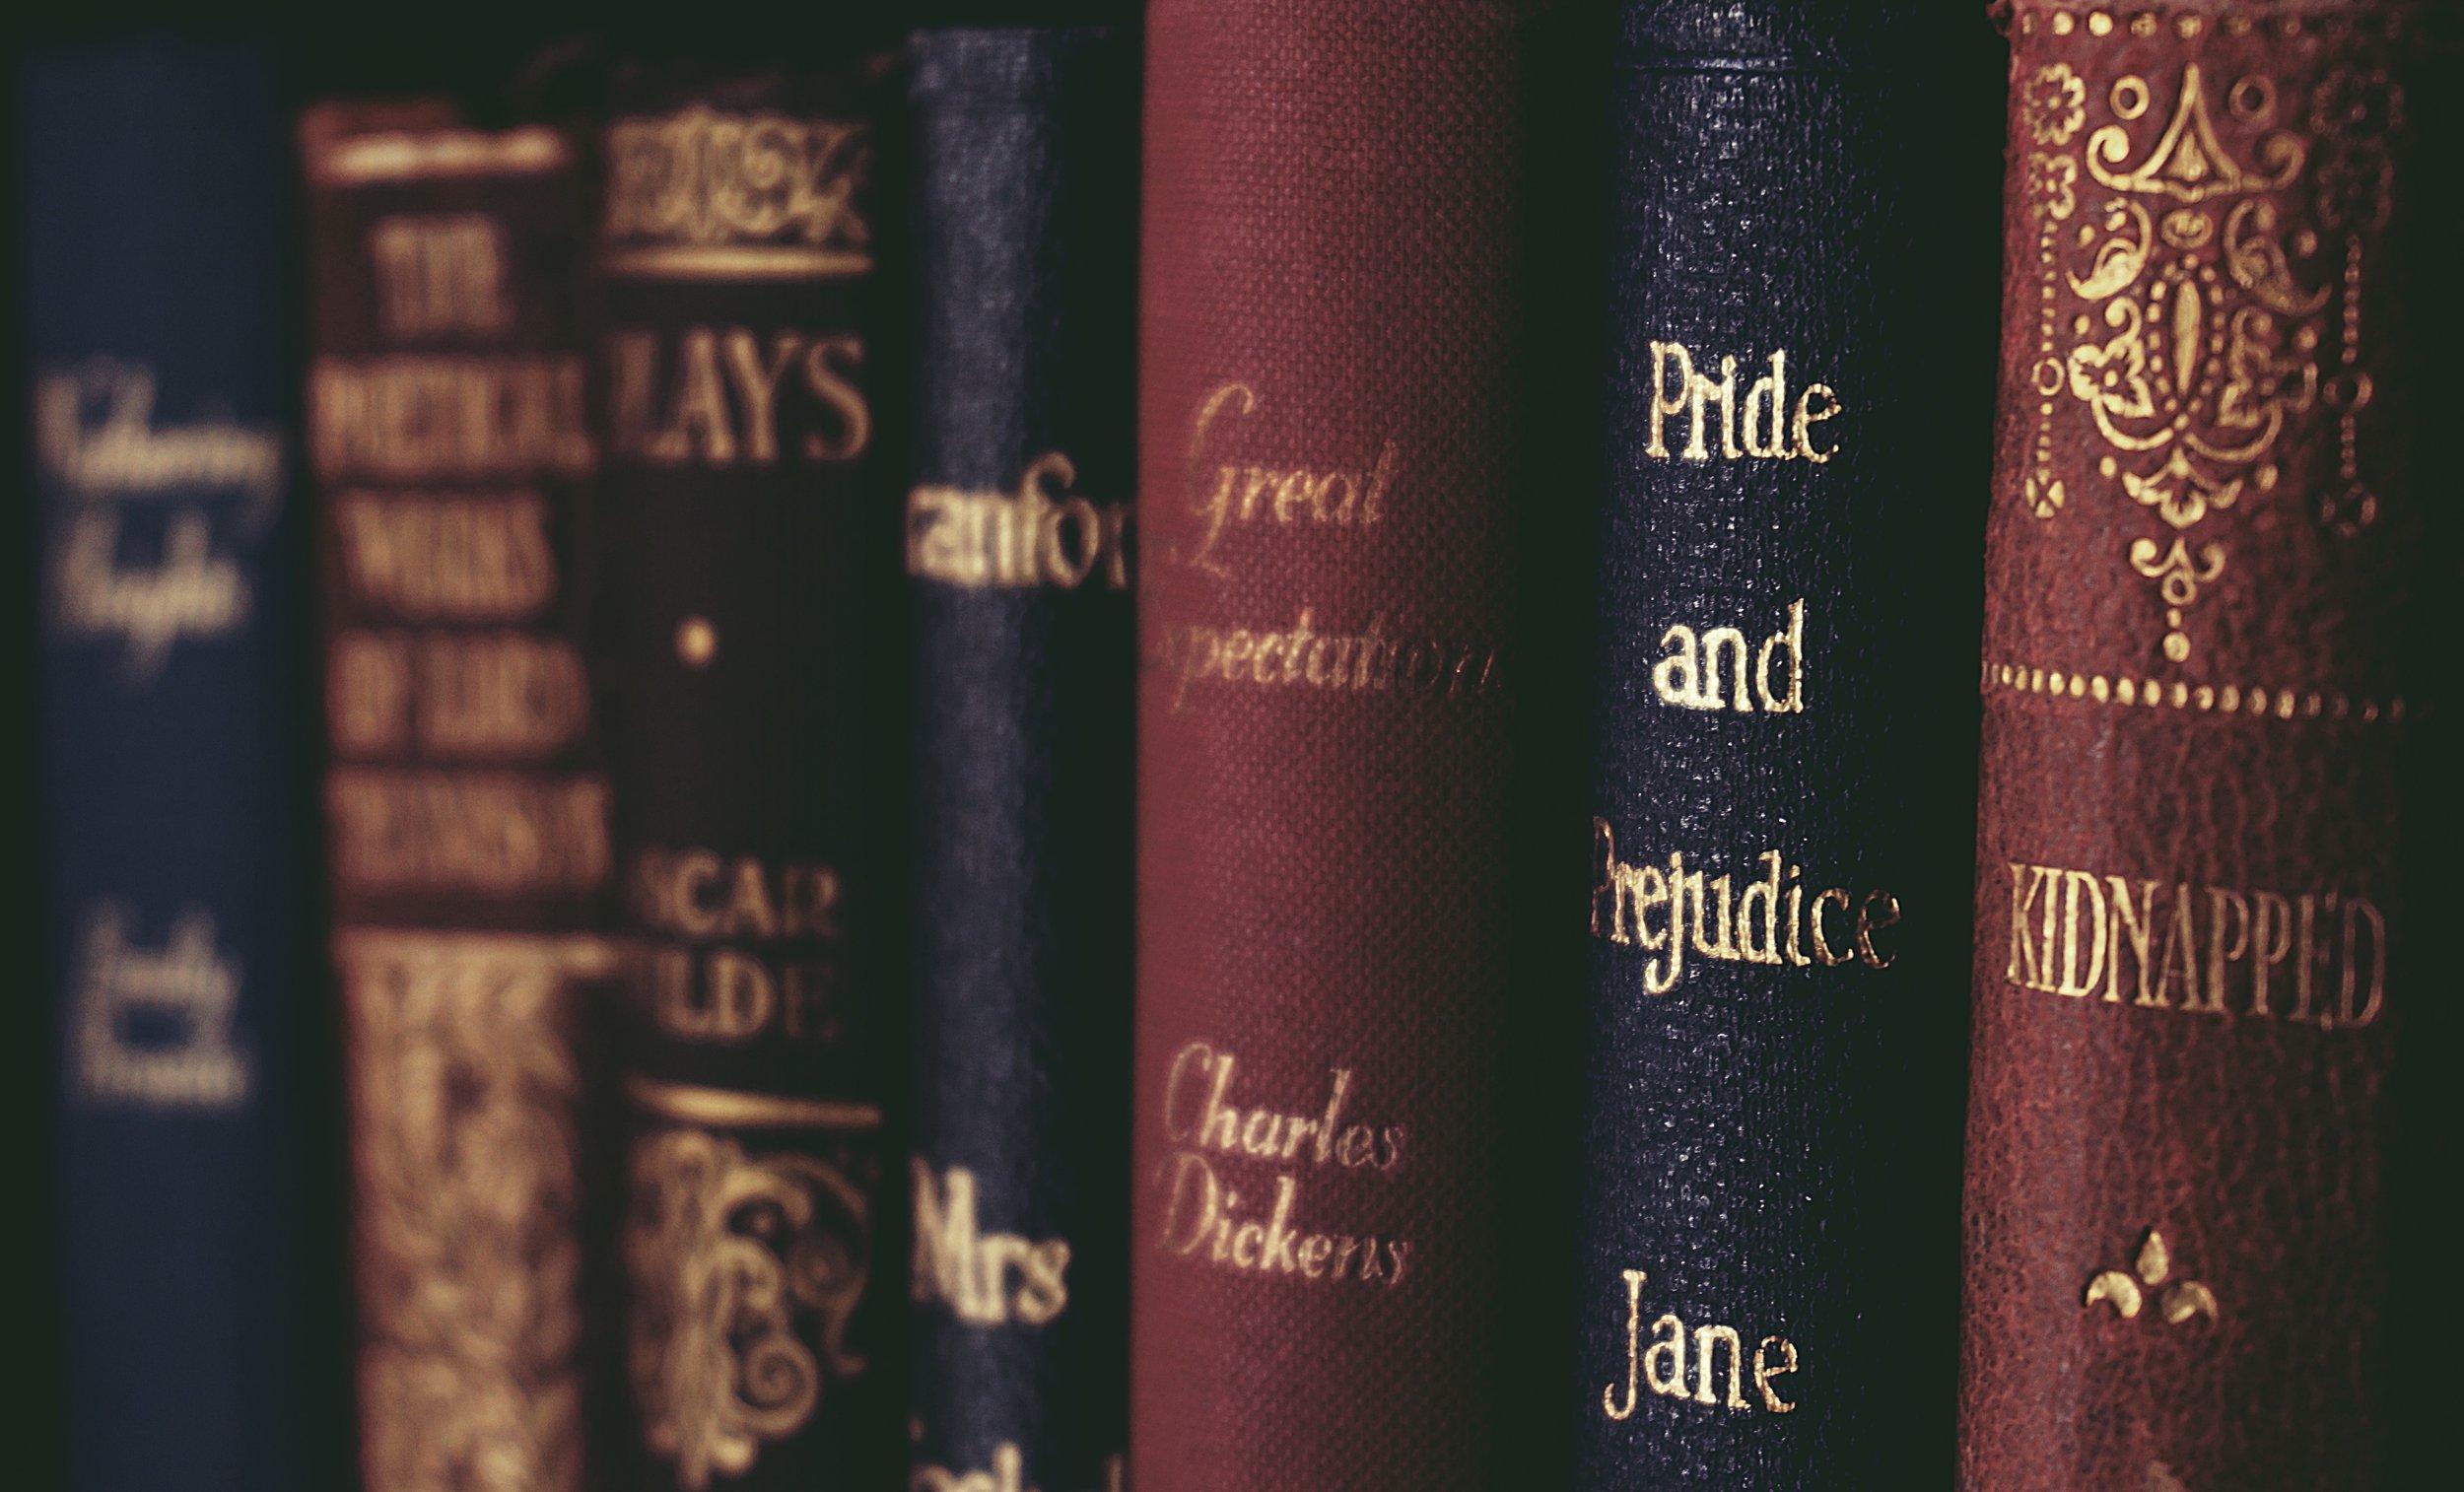 book-bindings-book-series-books-1560093.jpg